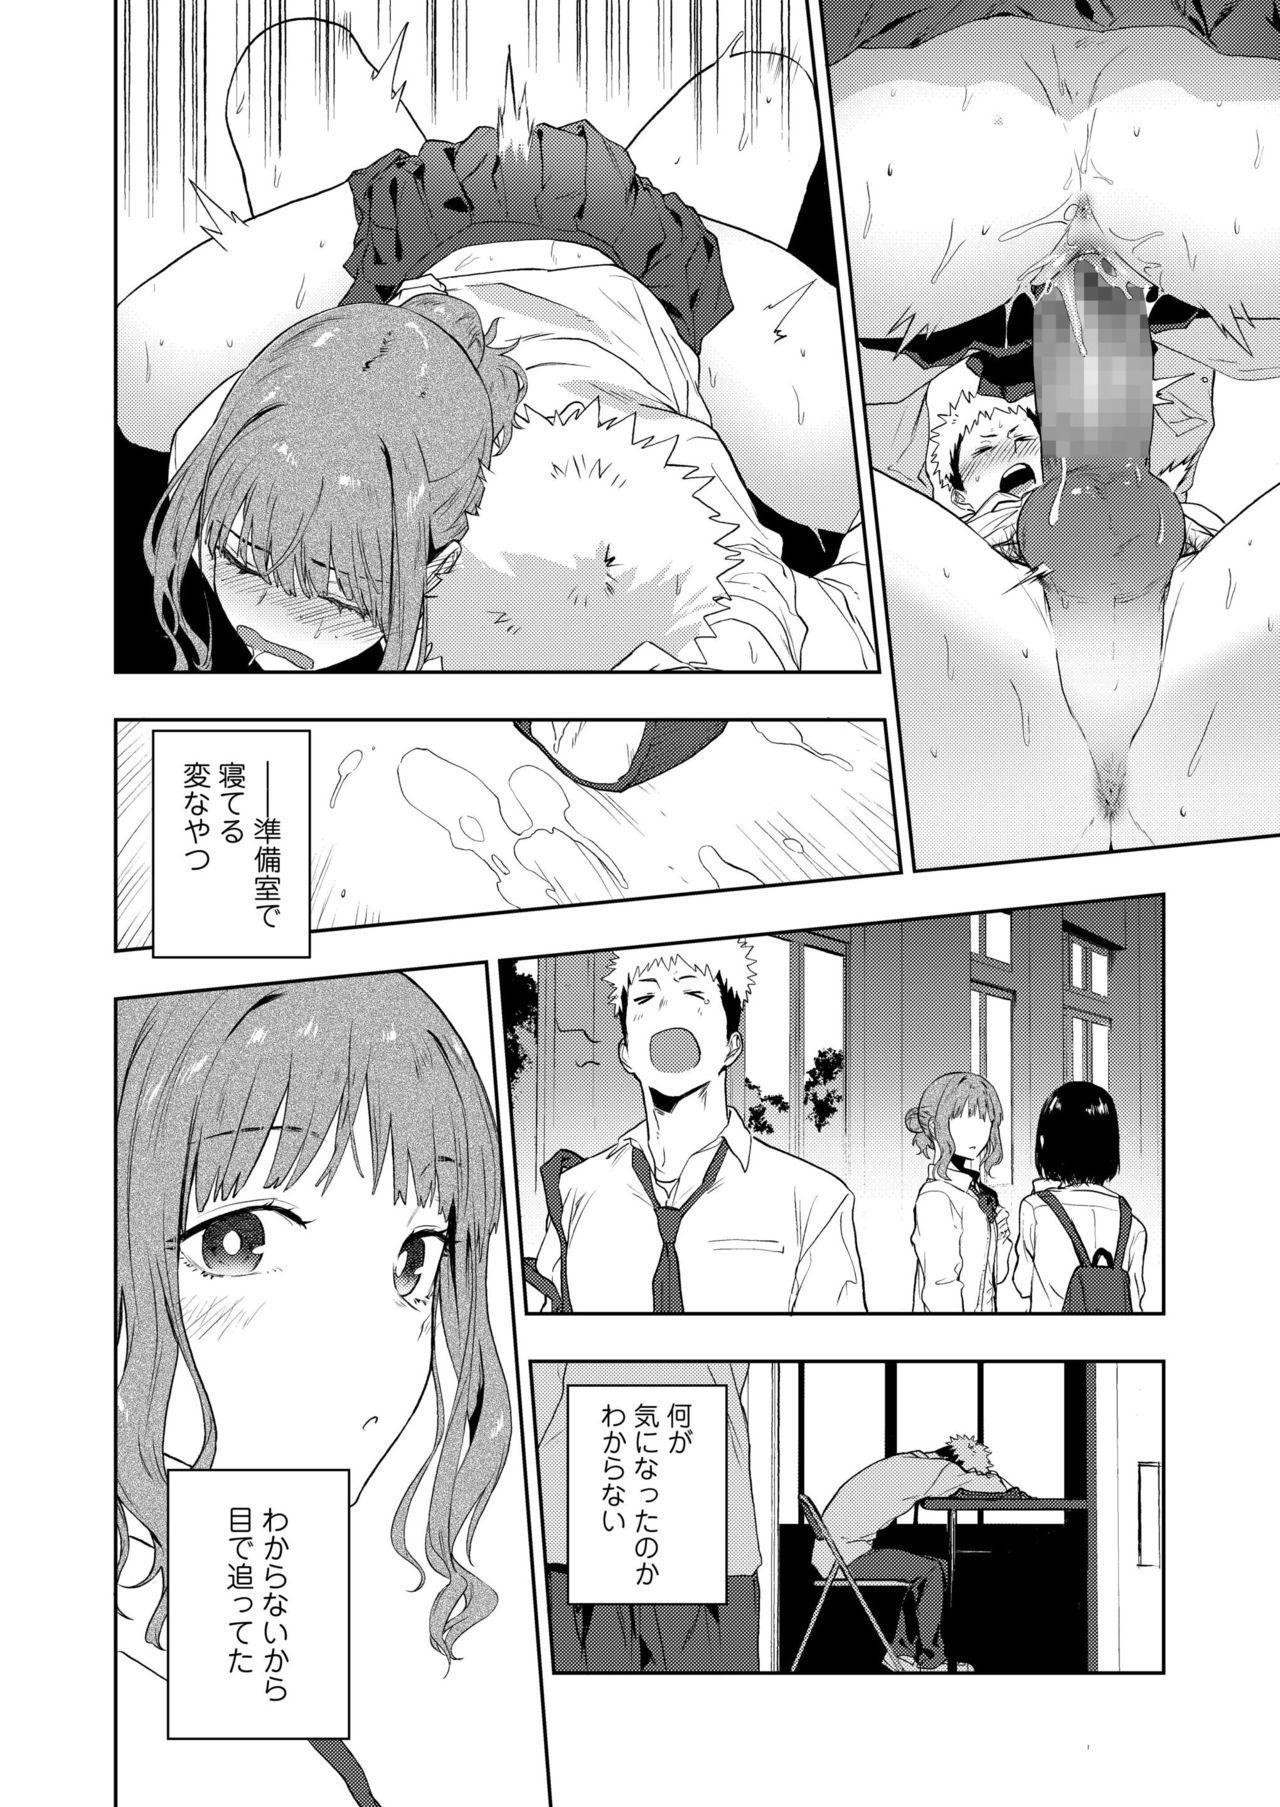 COMIC AOHA 2019 Haru 203